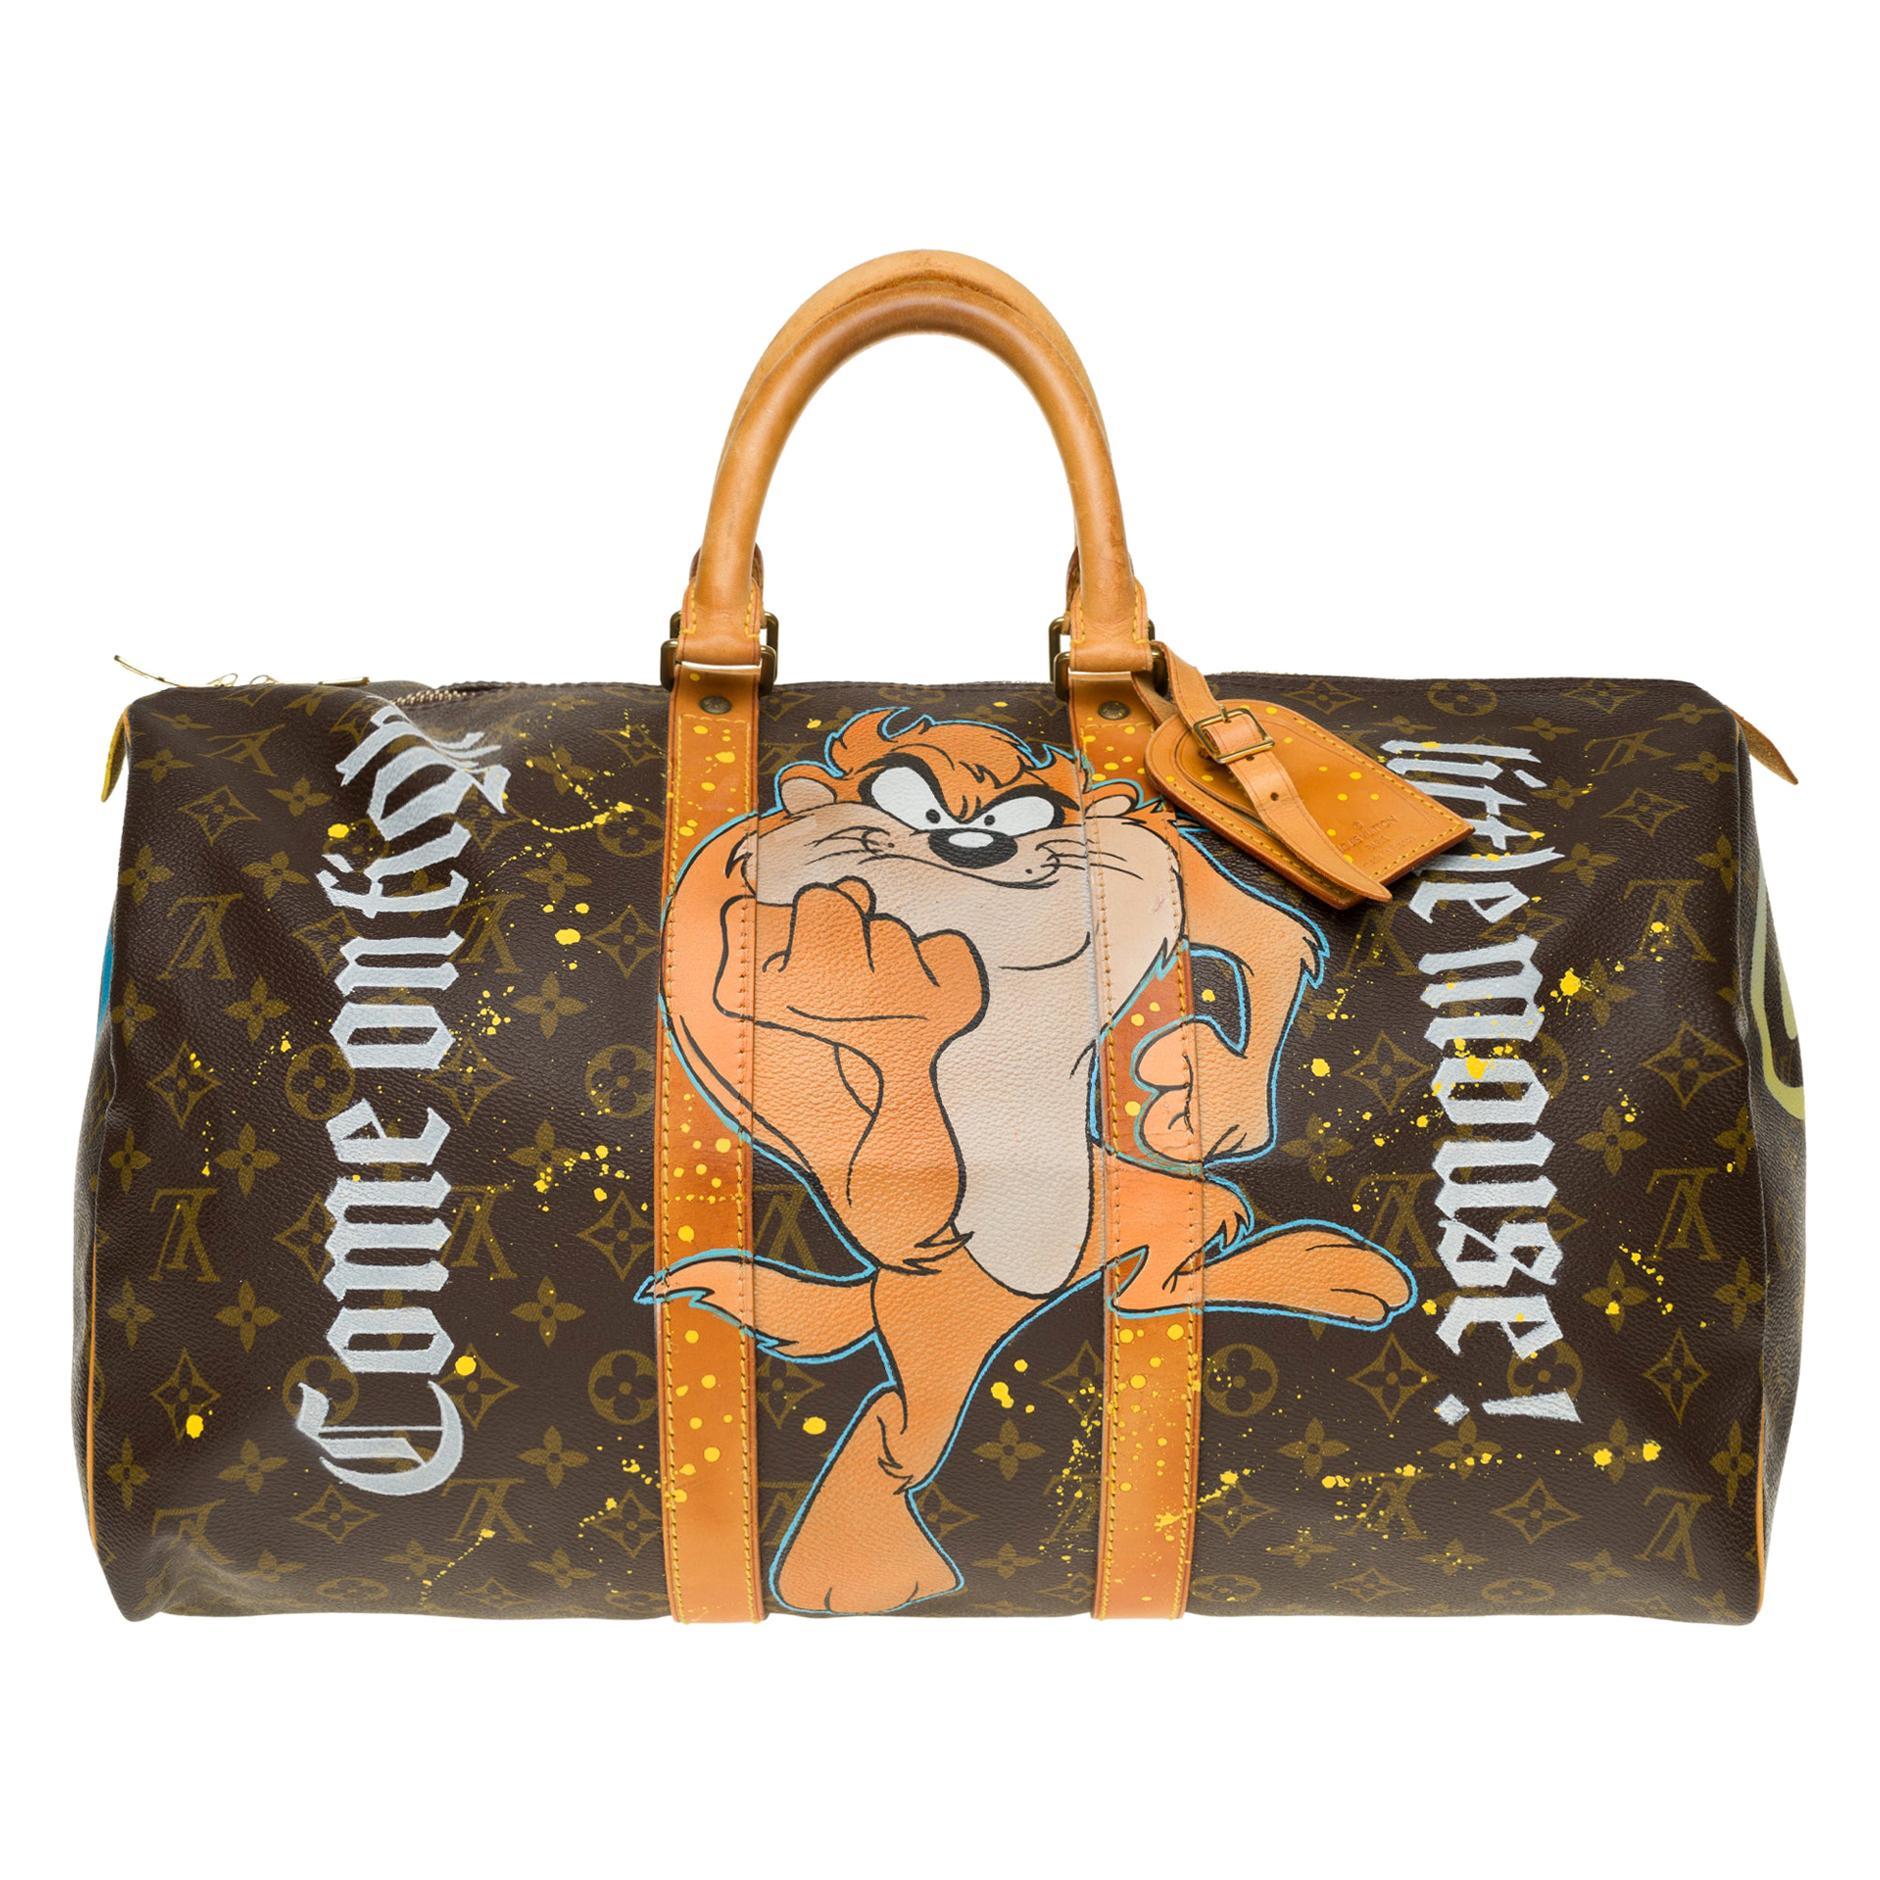 "Travel bag Louis Vuitton 45 Monogram customized ""Mickey Vs Taz"" by PatBo"